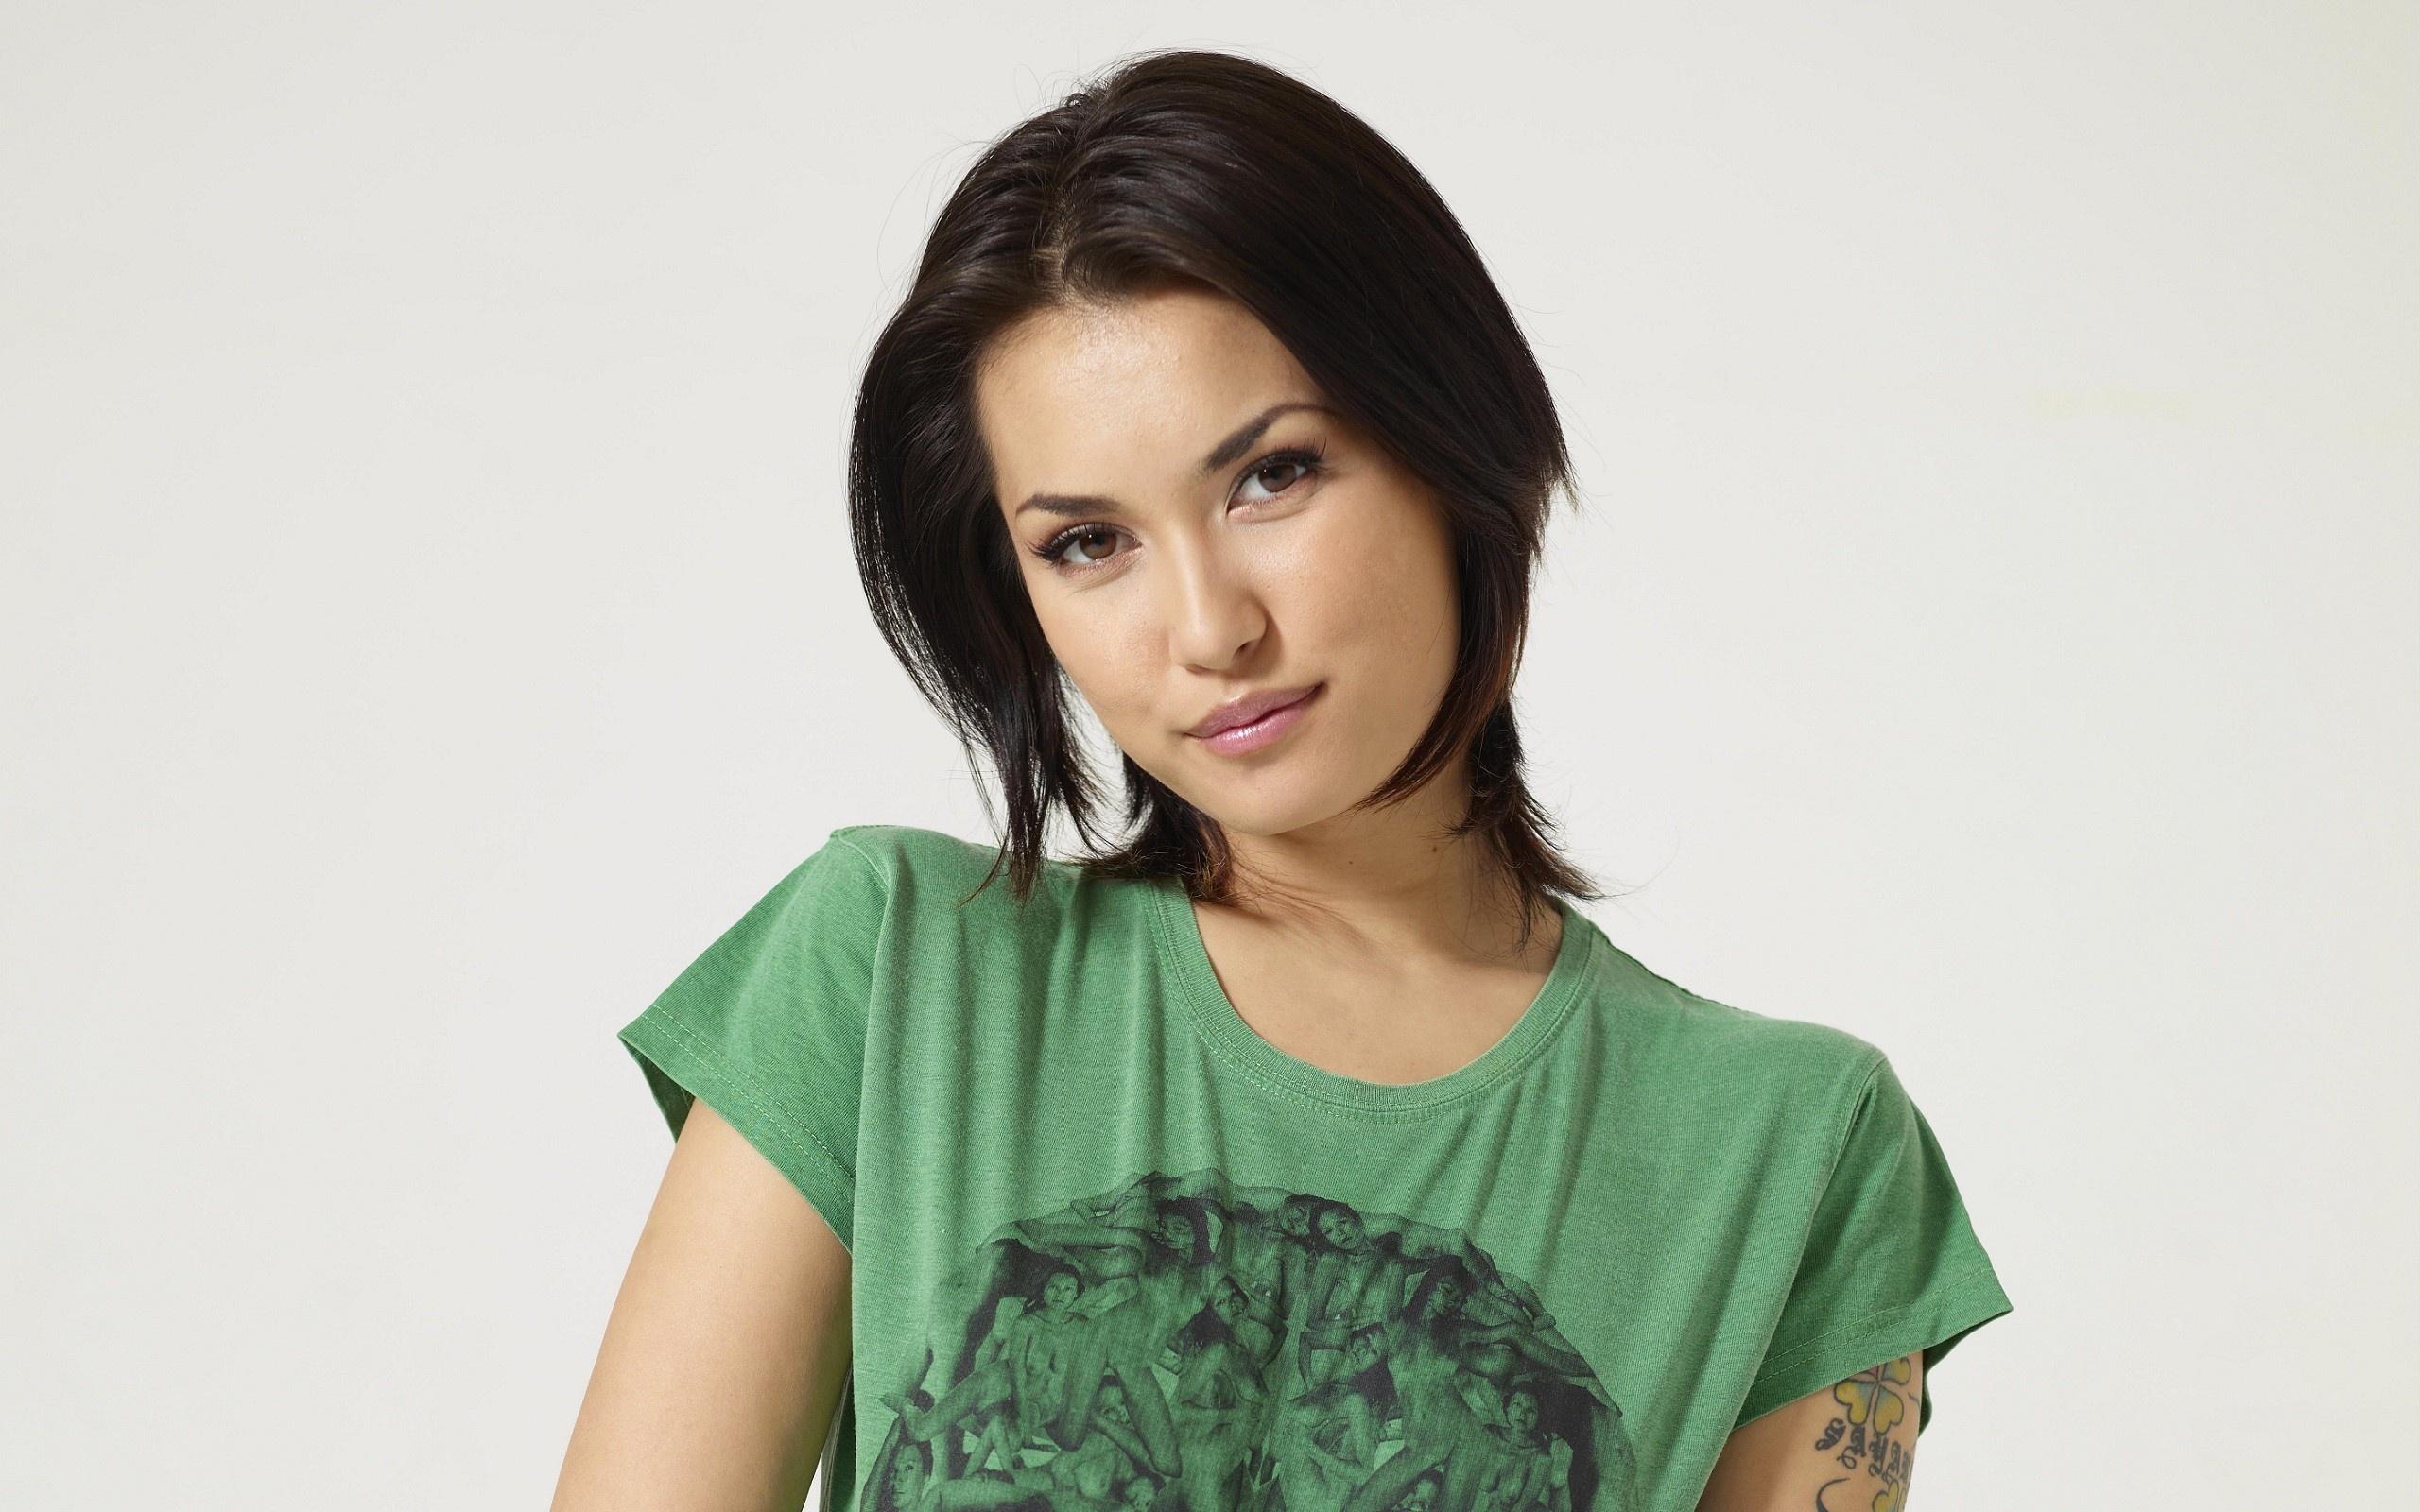 Wallpaper Maria Ozawa Asian White Background T Shirt Short